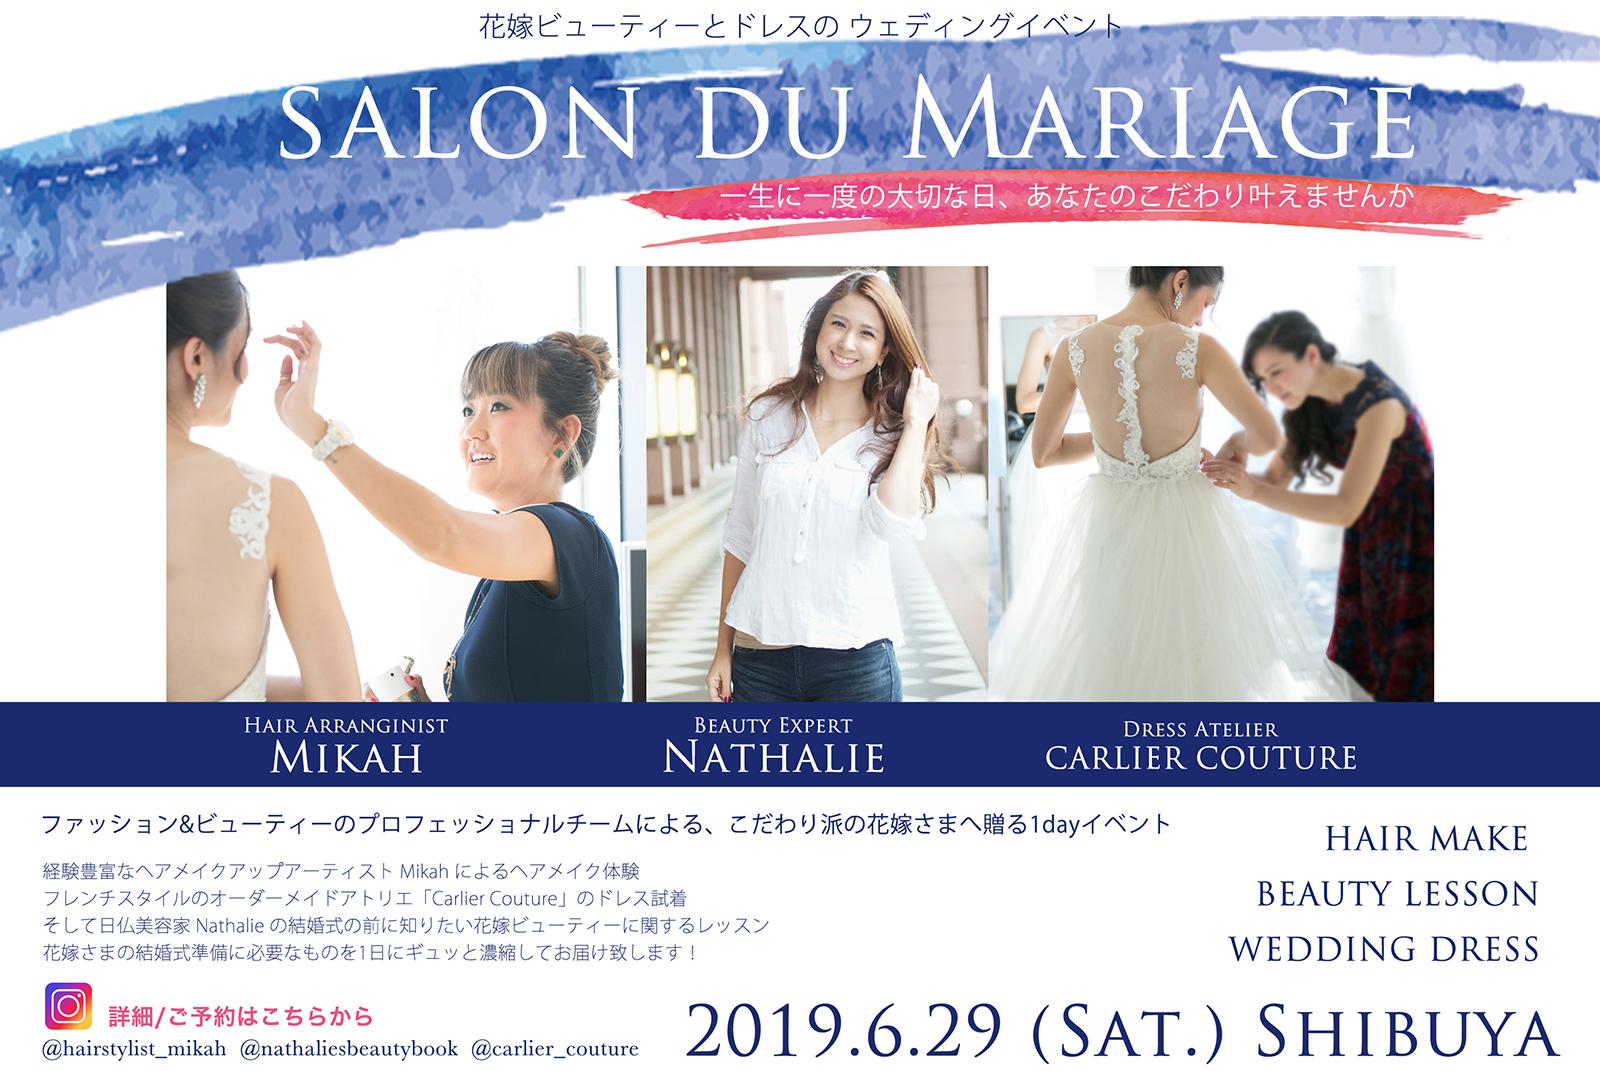 salon-du-mariage-TEXT_1